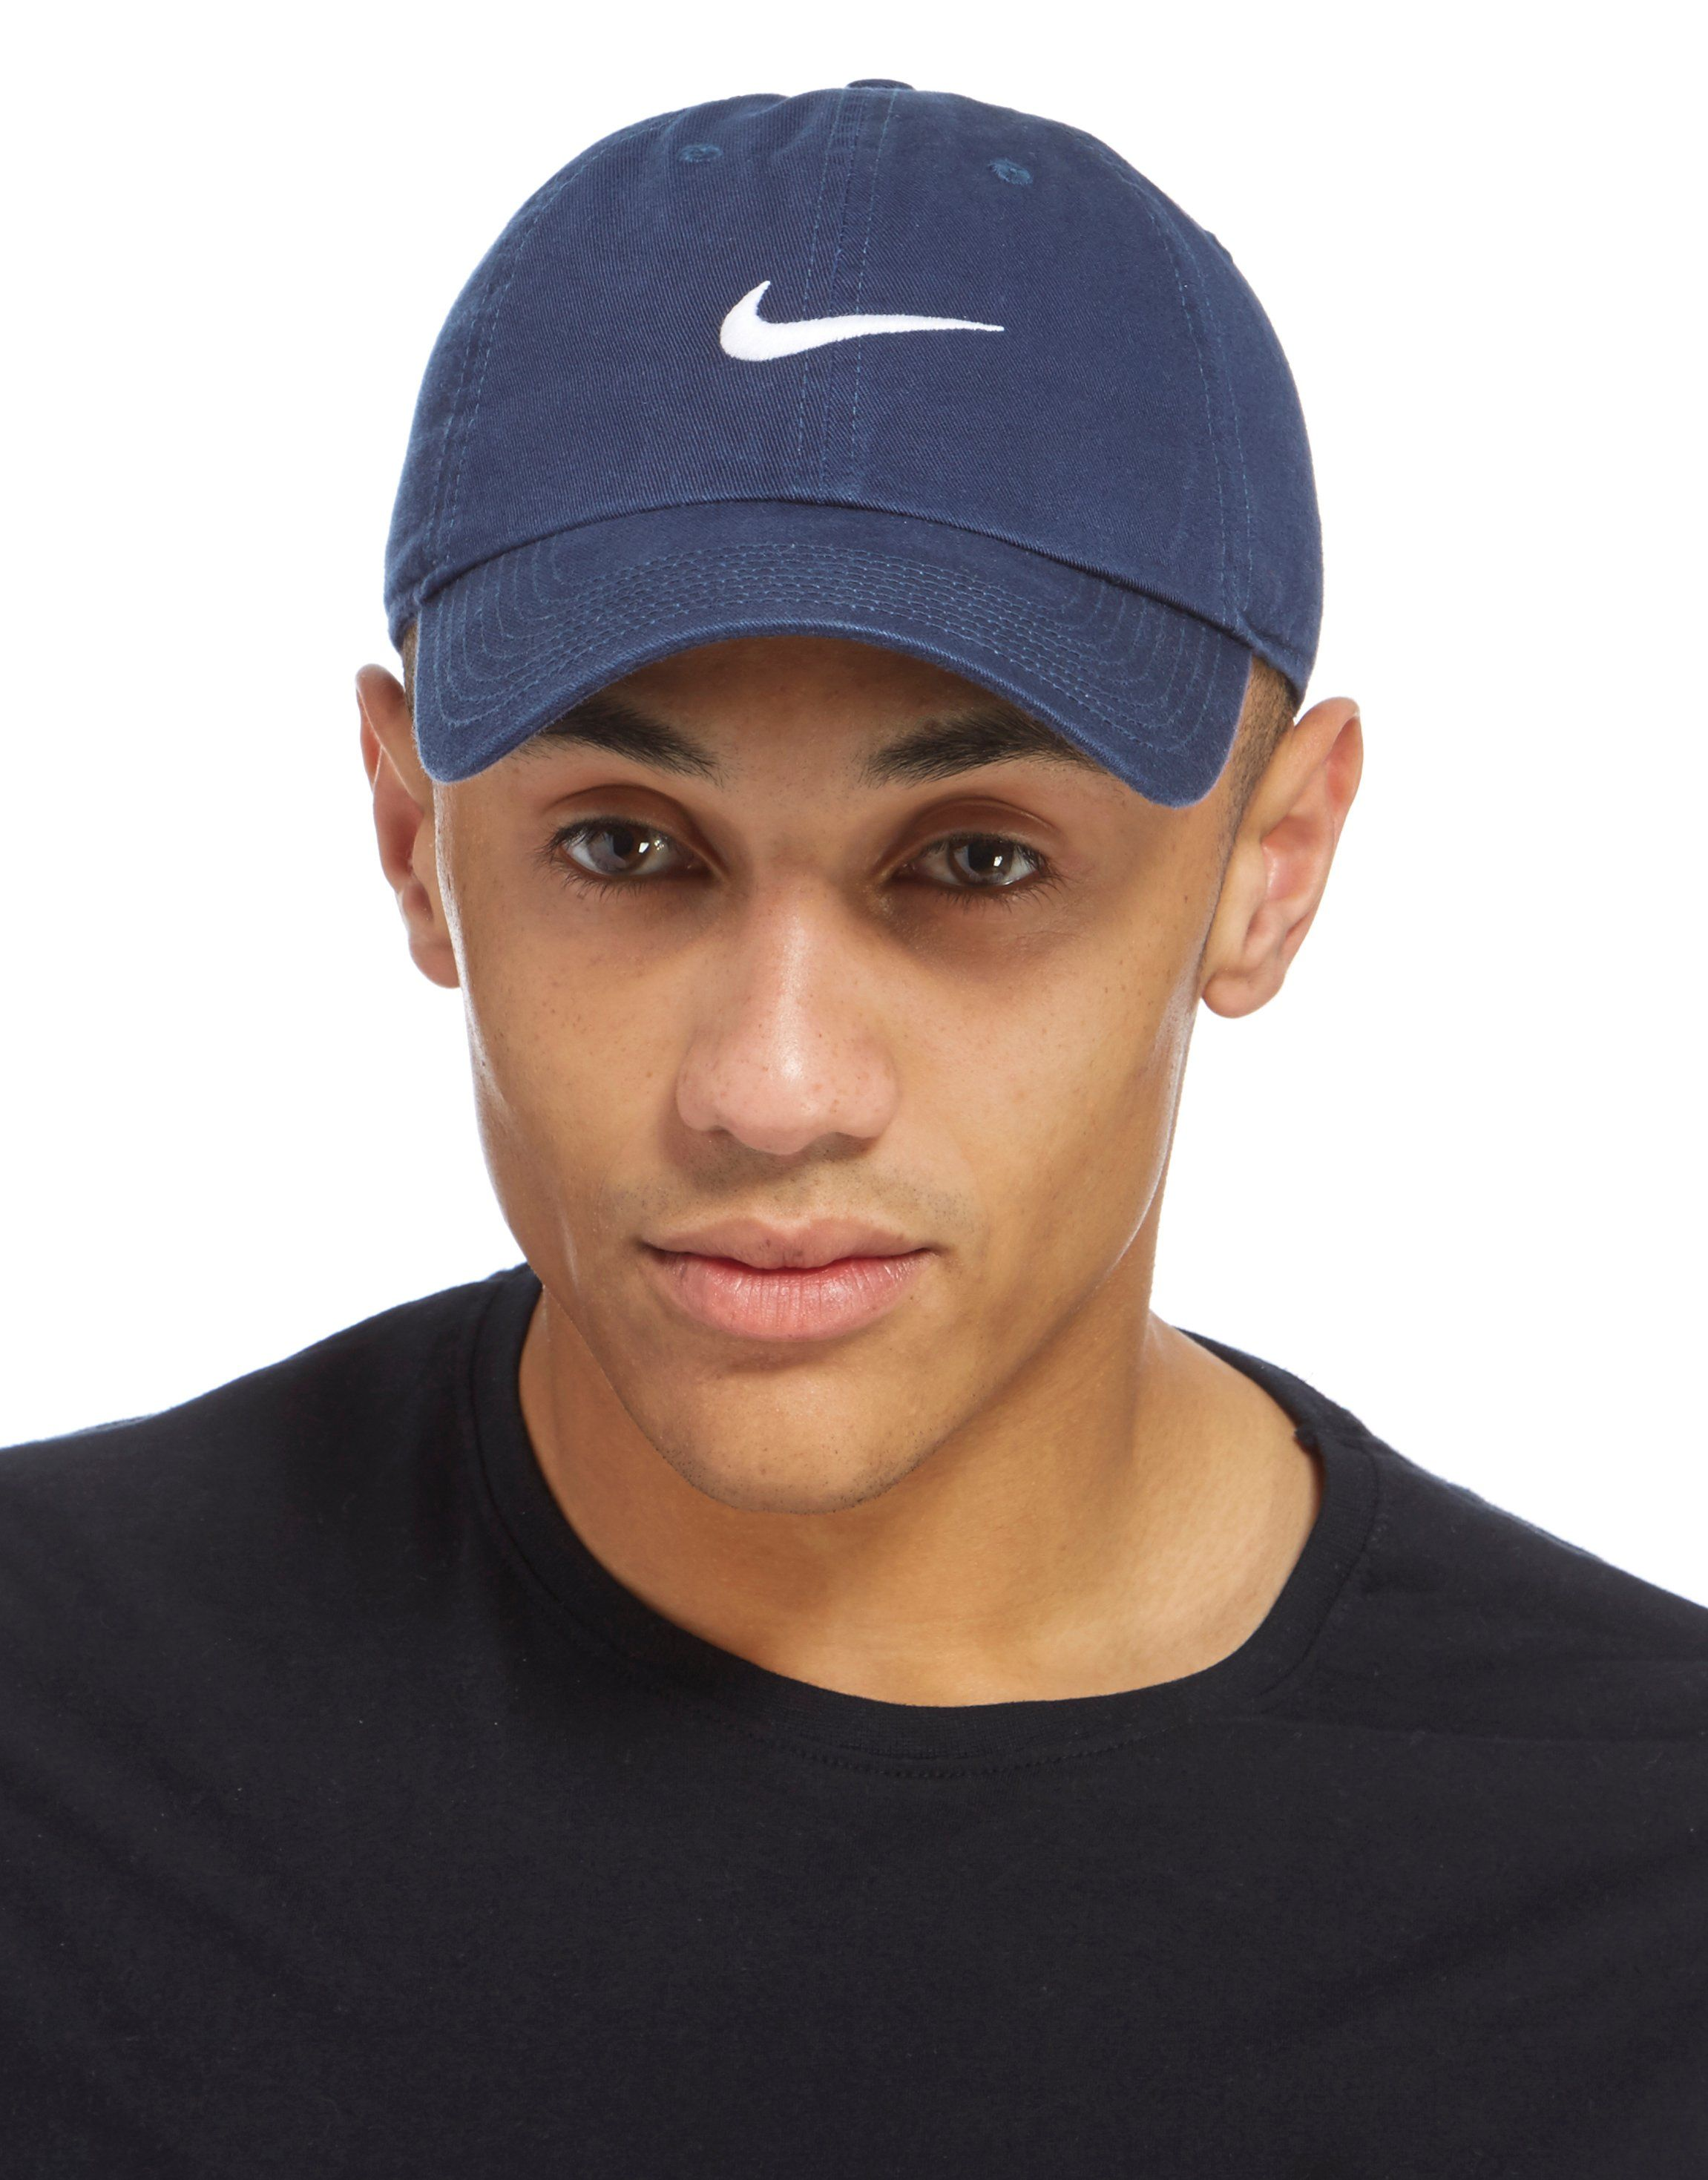 Nike Swoosh 86 Cap